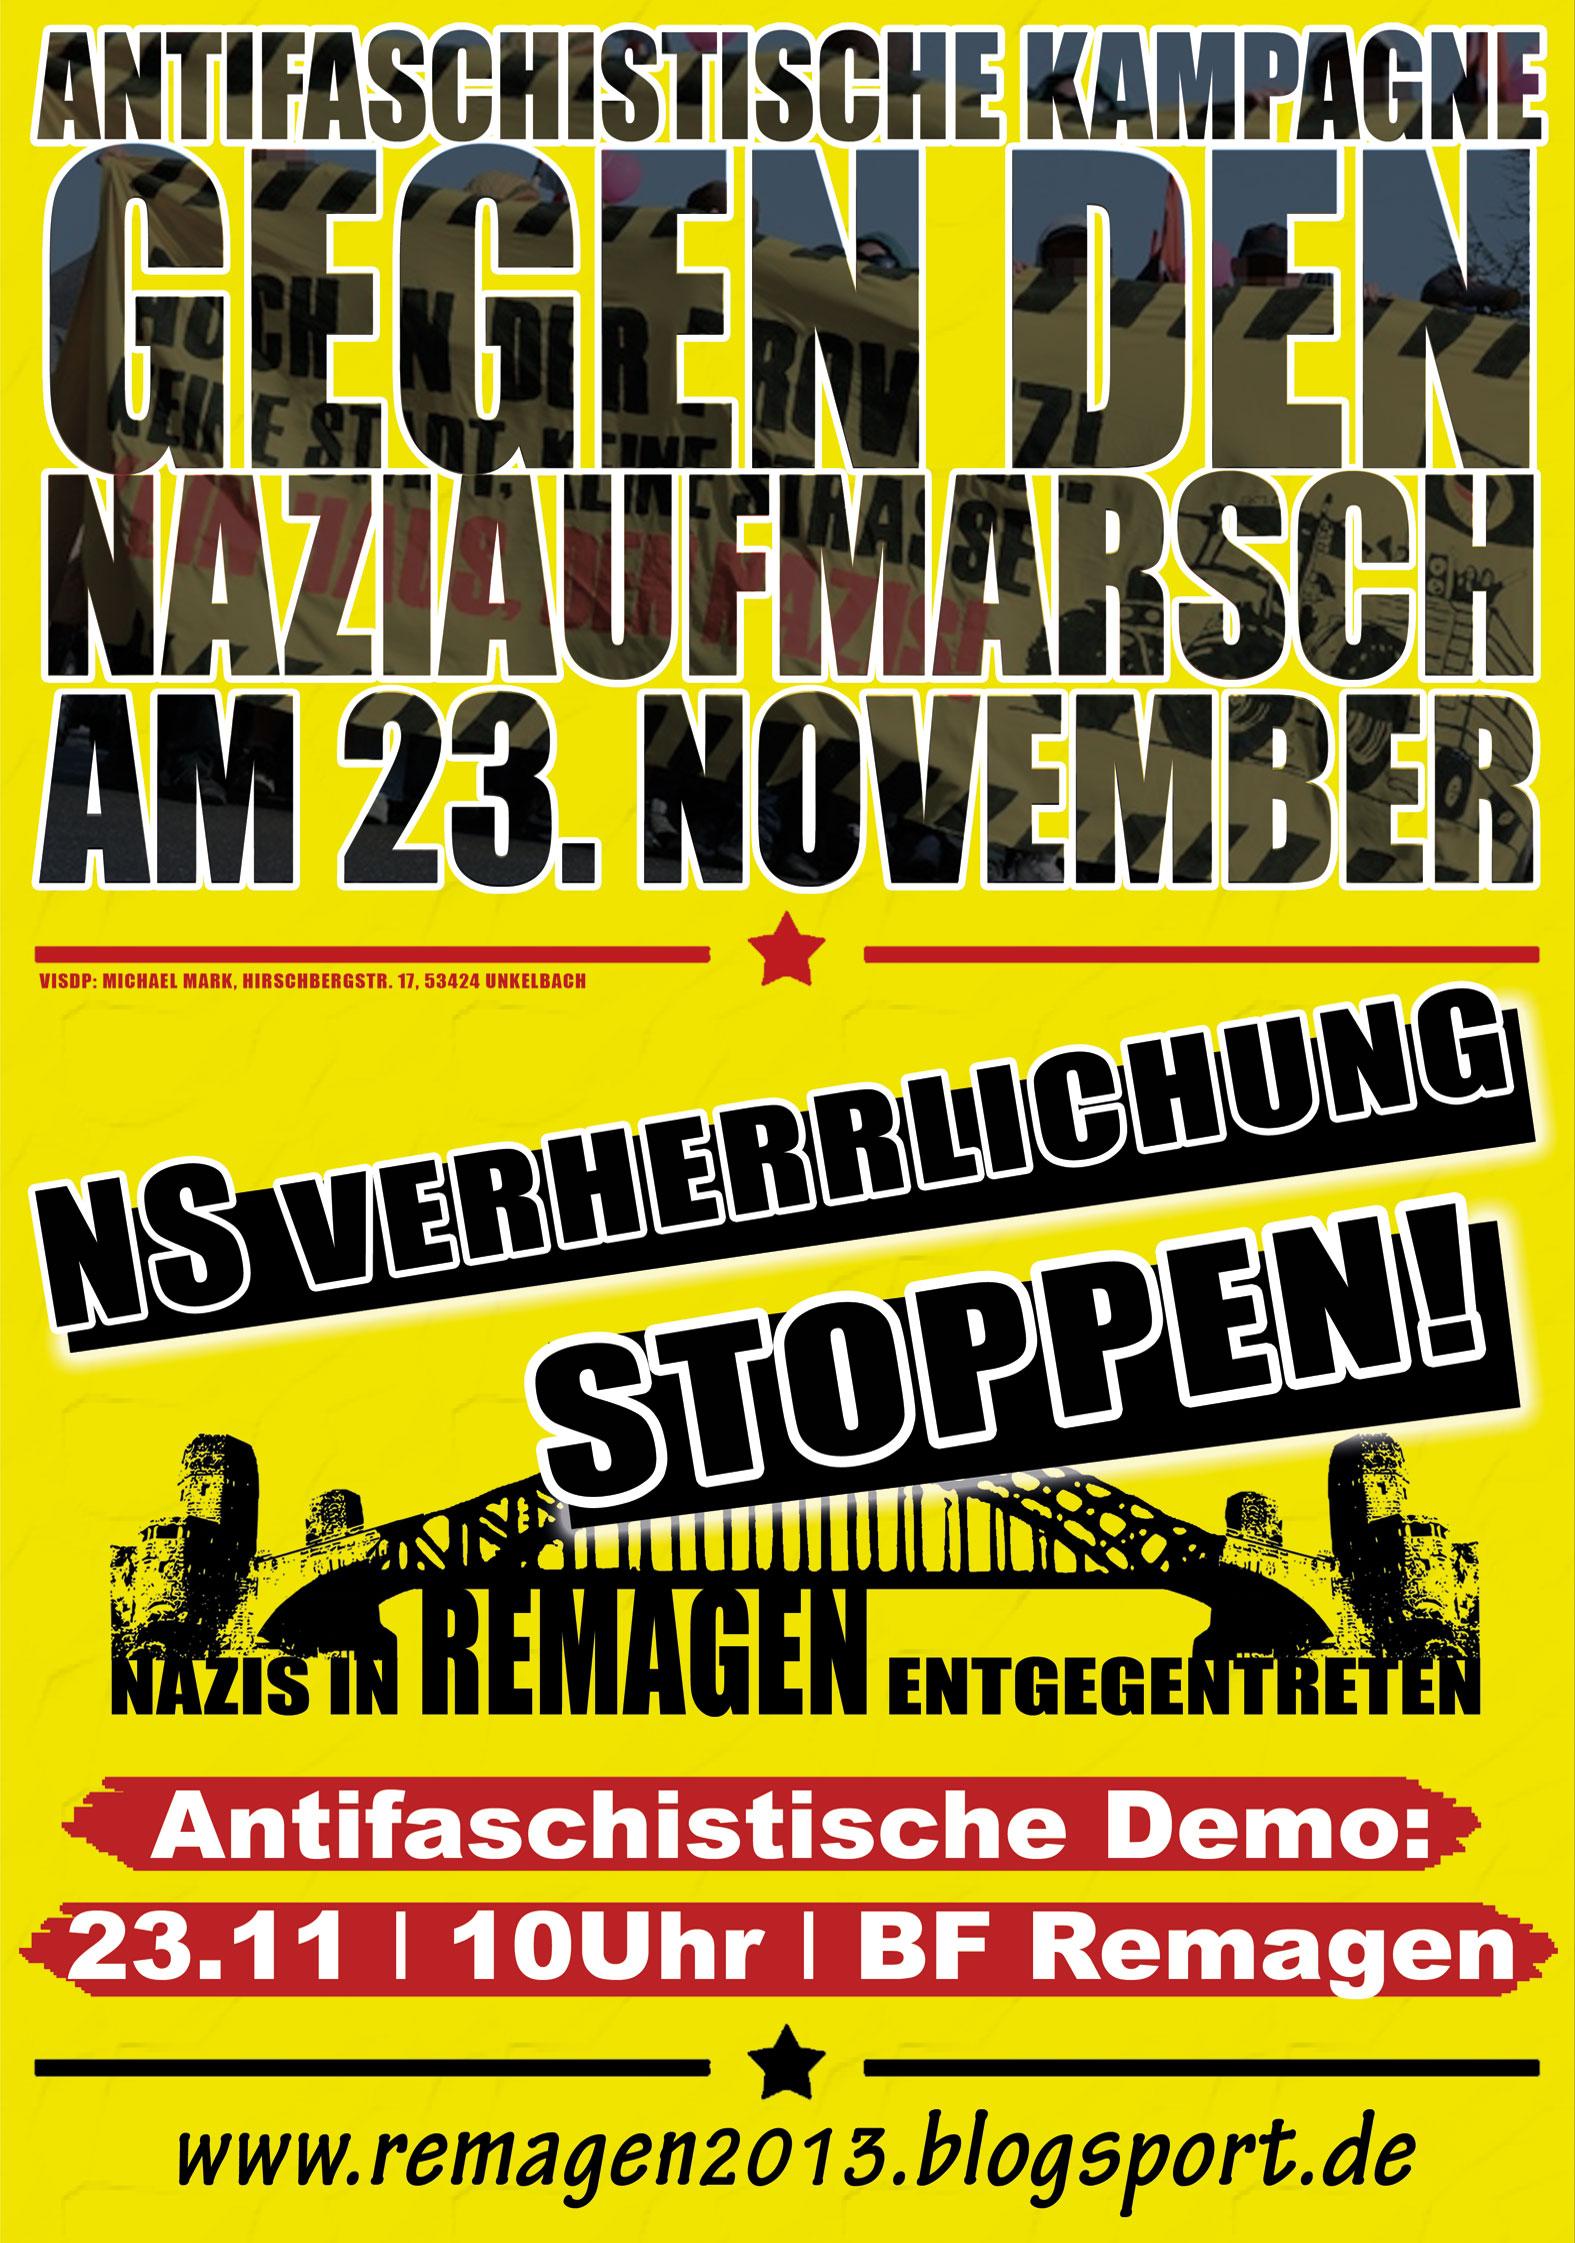 http://remagen2013.blogsport.de/images/Kampagnenplakat.jpg